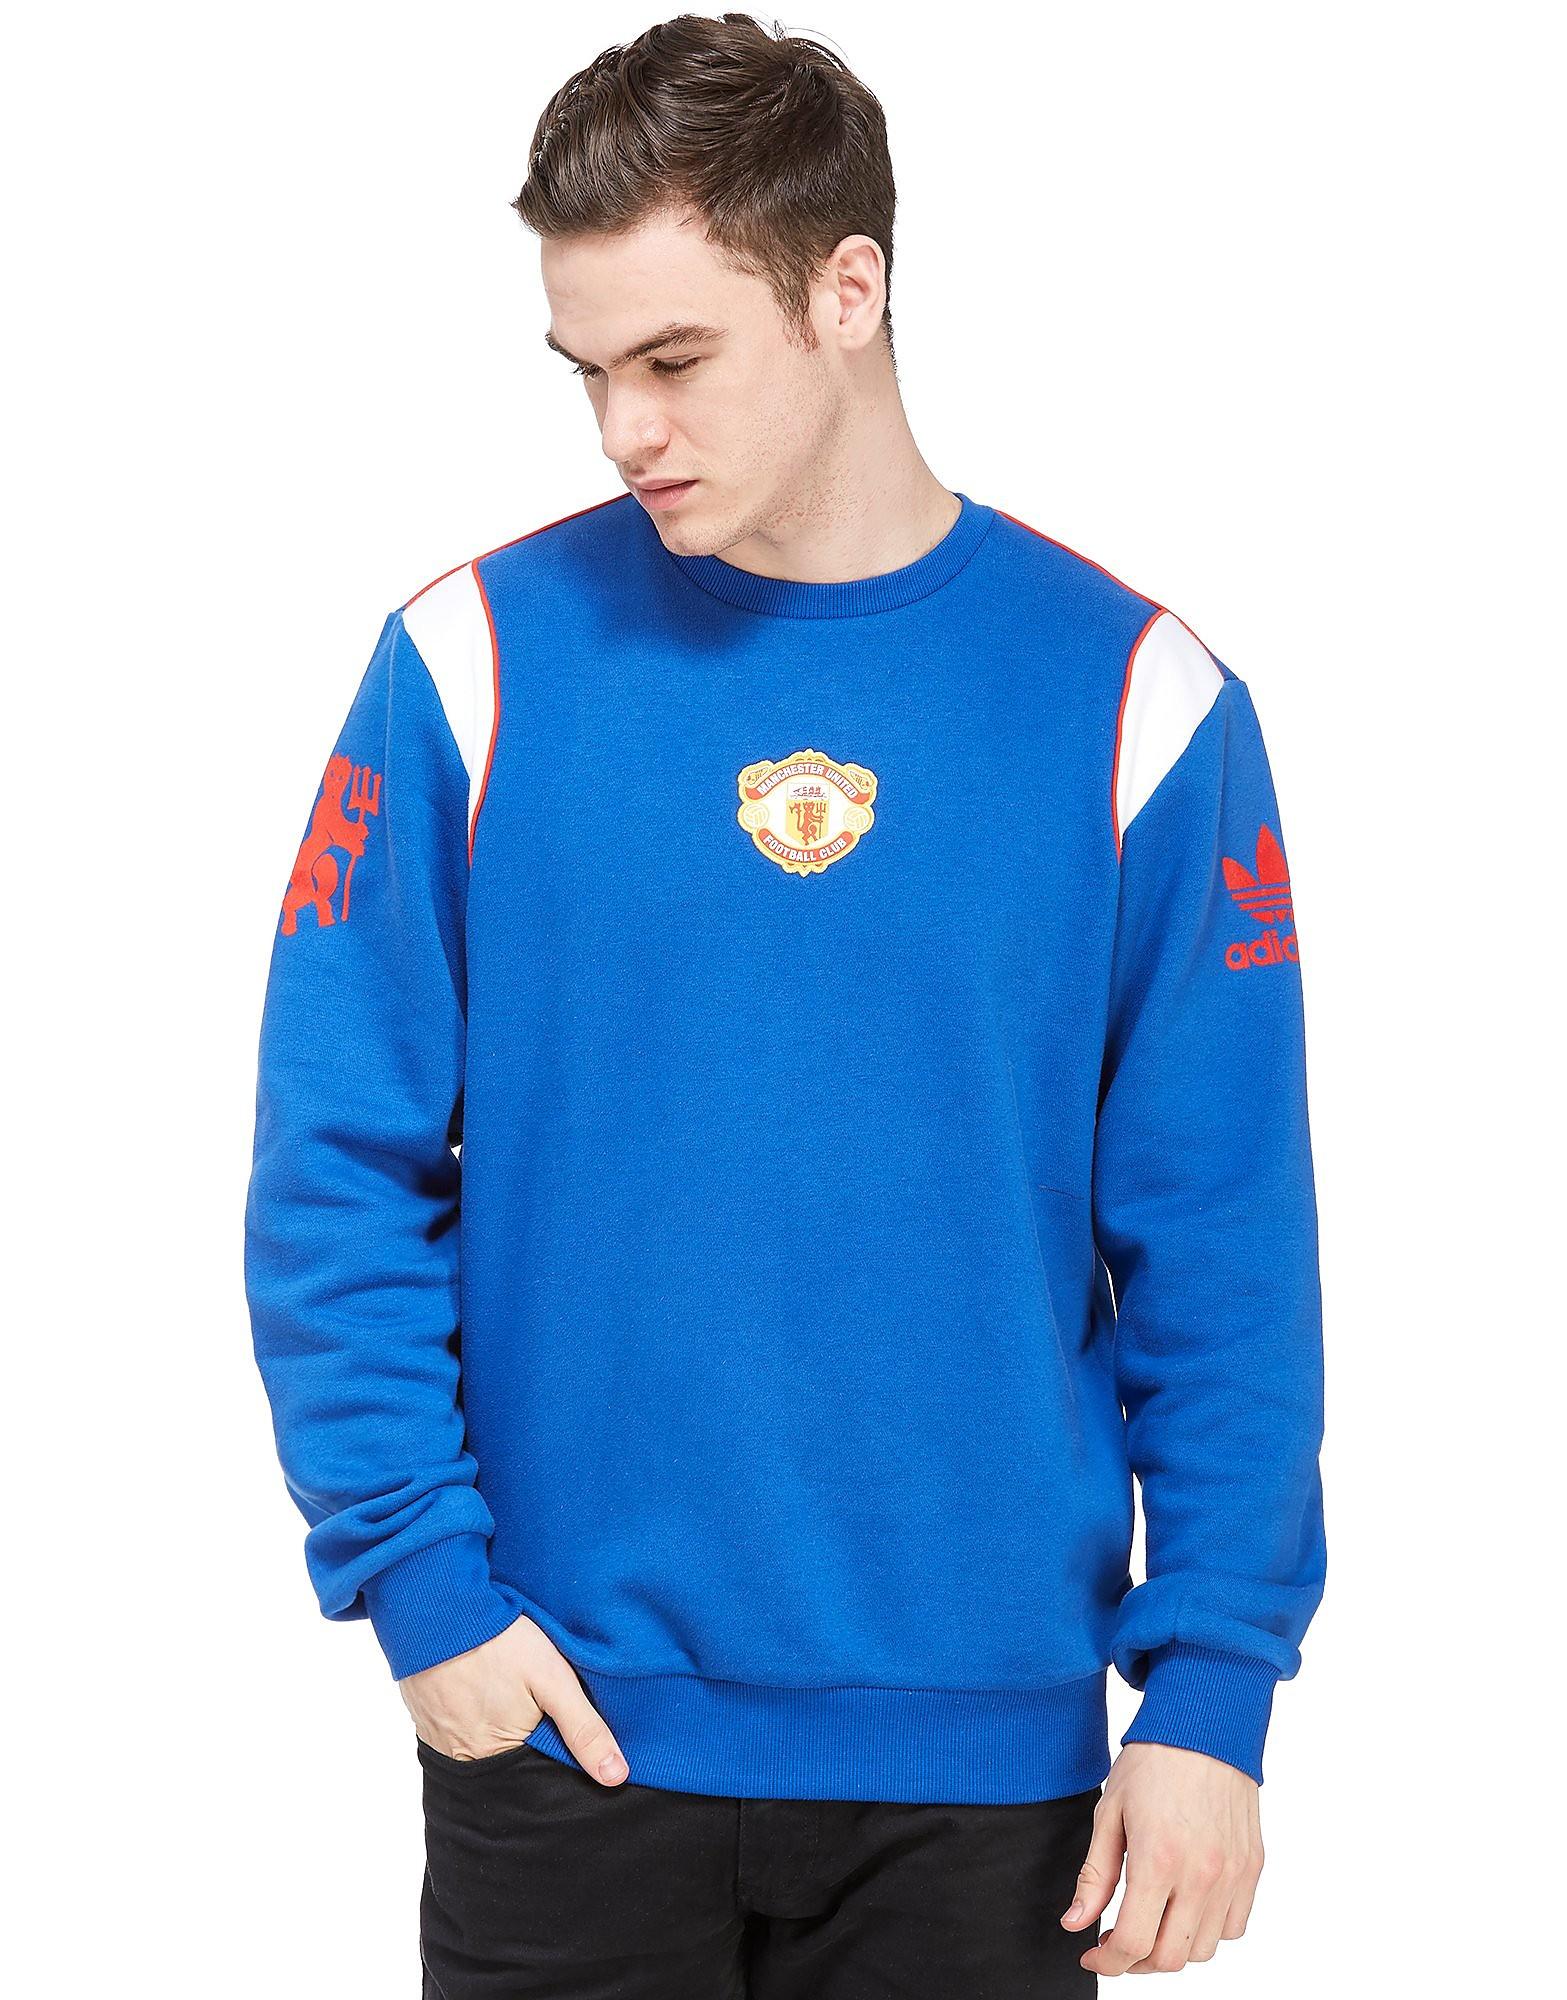 adidas Originals Manchester United FC Crew Sweatshirt